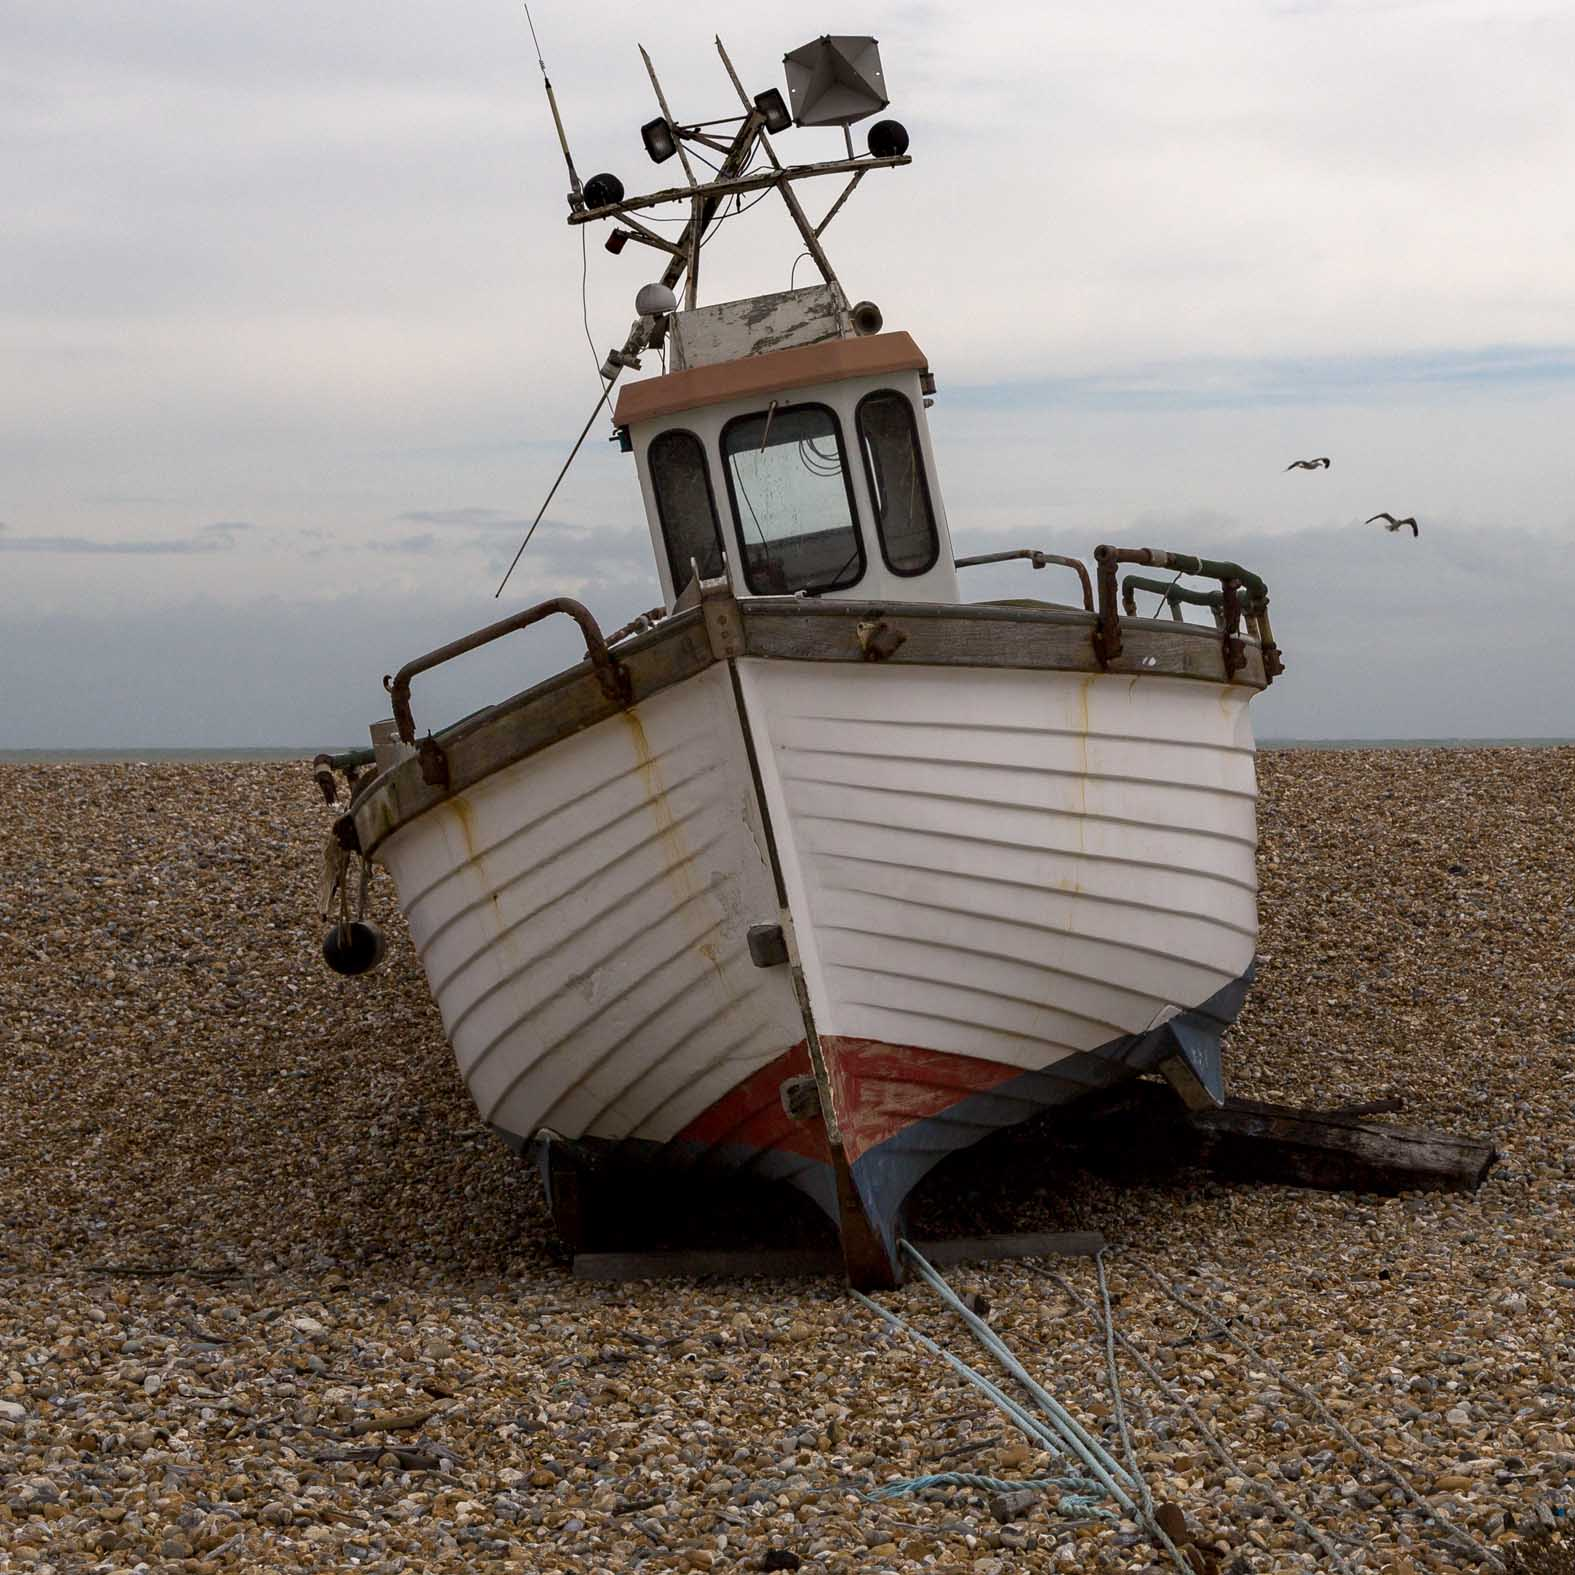 Dungeness, Kent Landscape, Clare Hocter Photography, Hastings Photographer, St Leonards Photographer